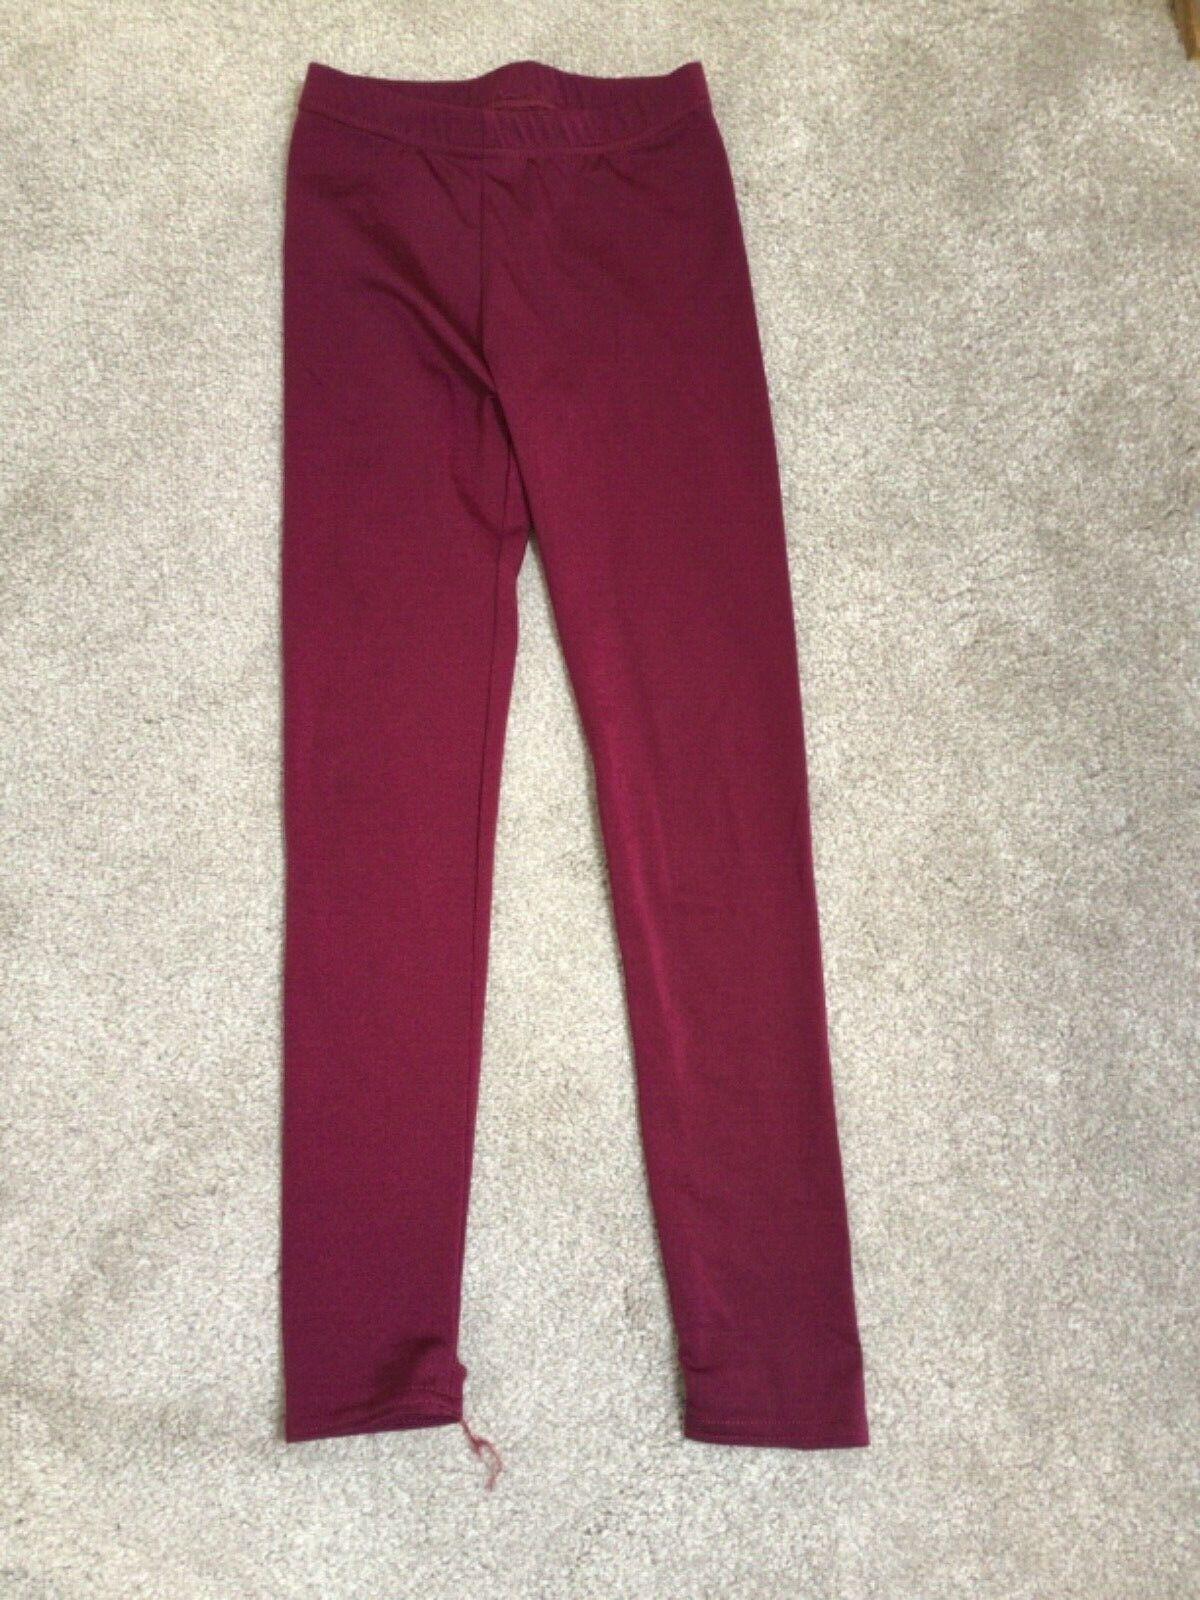 Girls shiny burgundy dance stirrup leggings 6-7 years